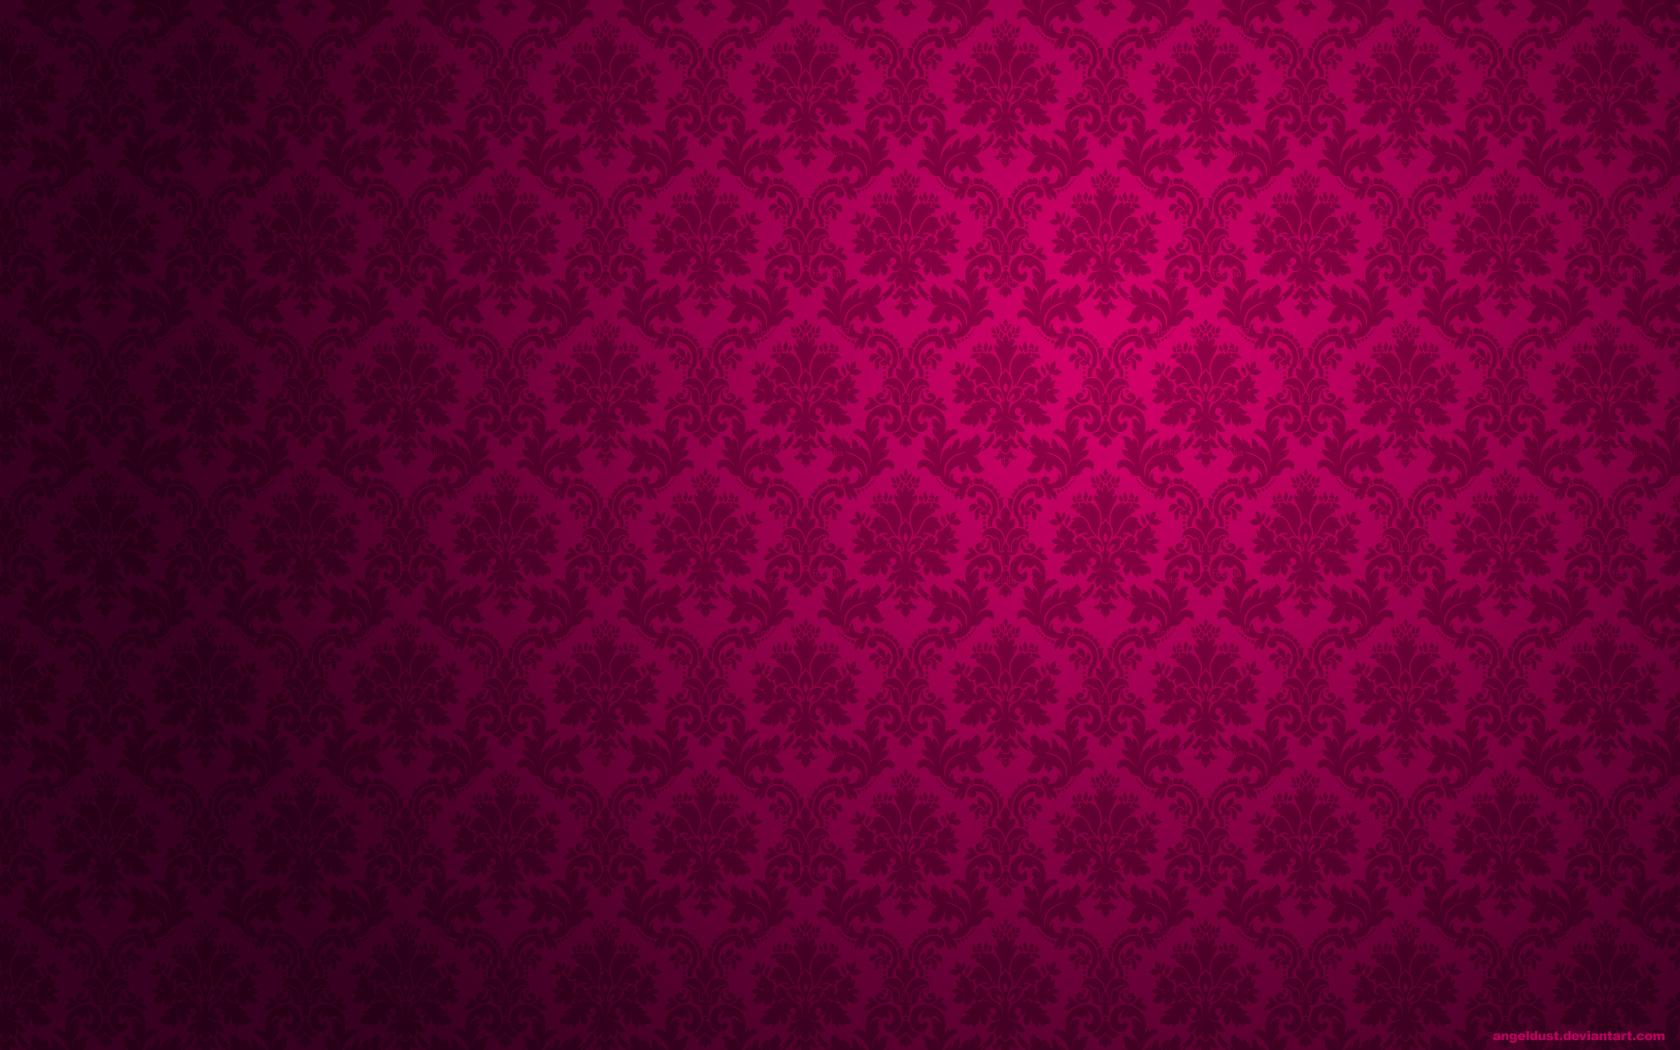 damask floral design wallpaper by angeldust customization wallpaper 1680x1050